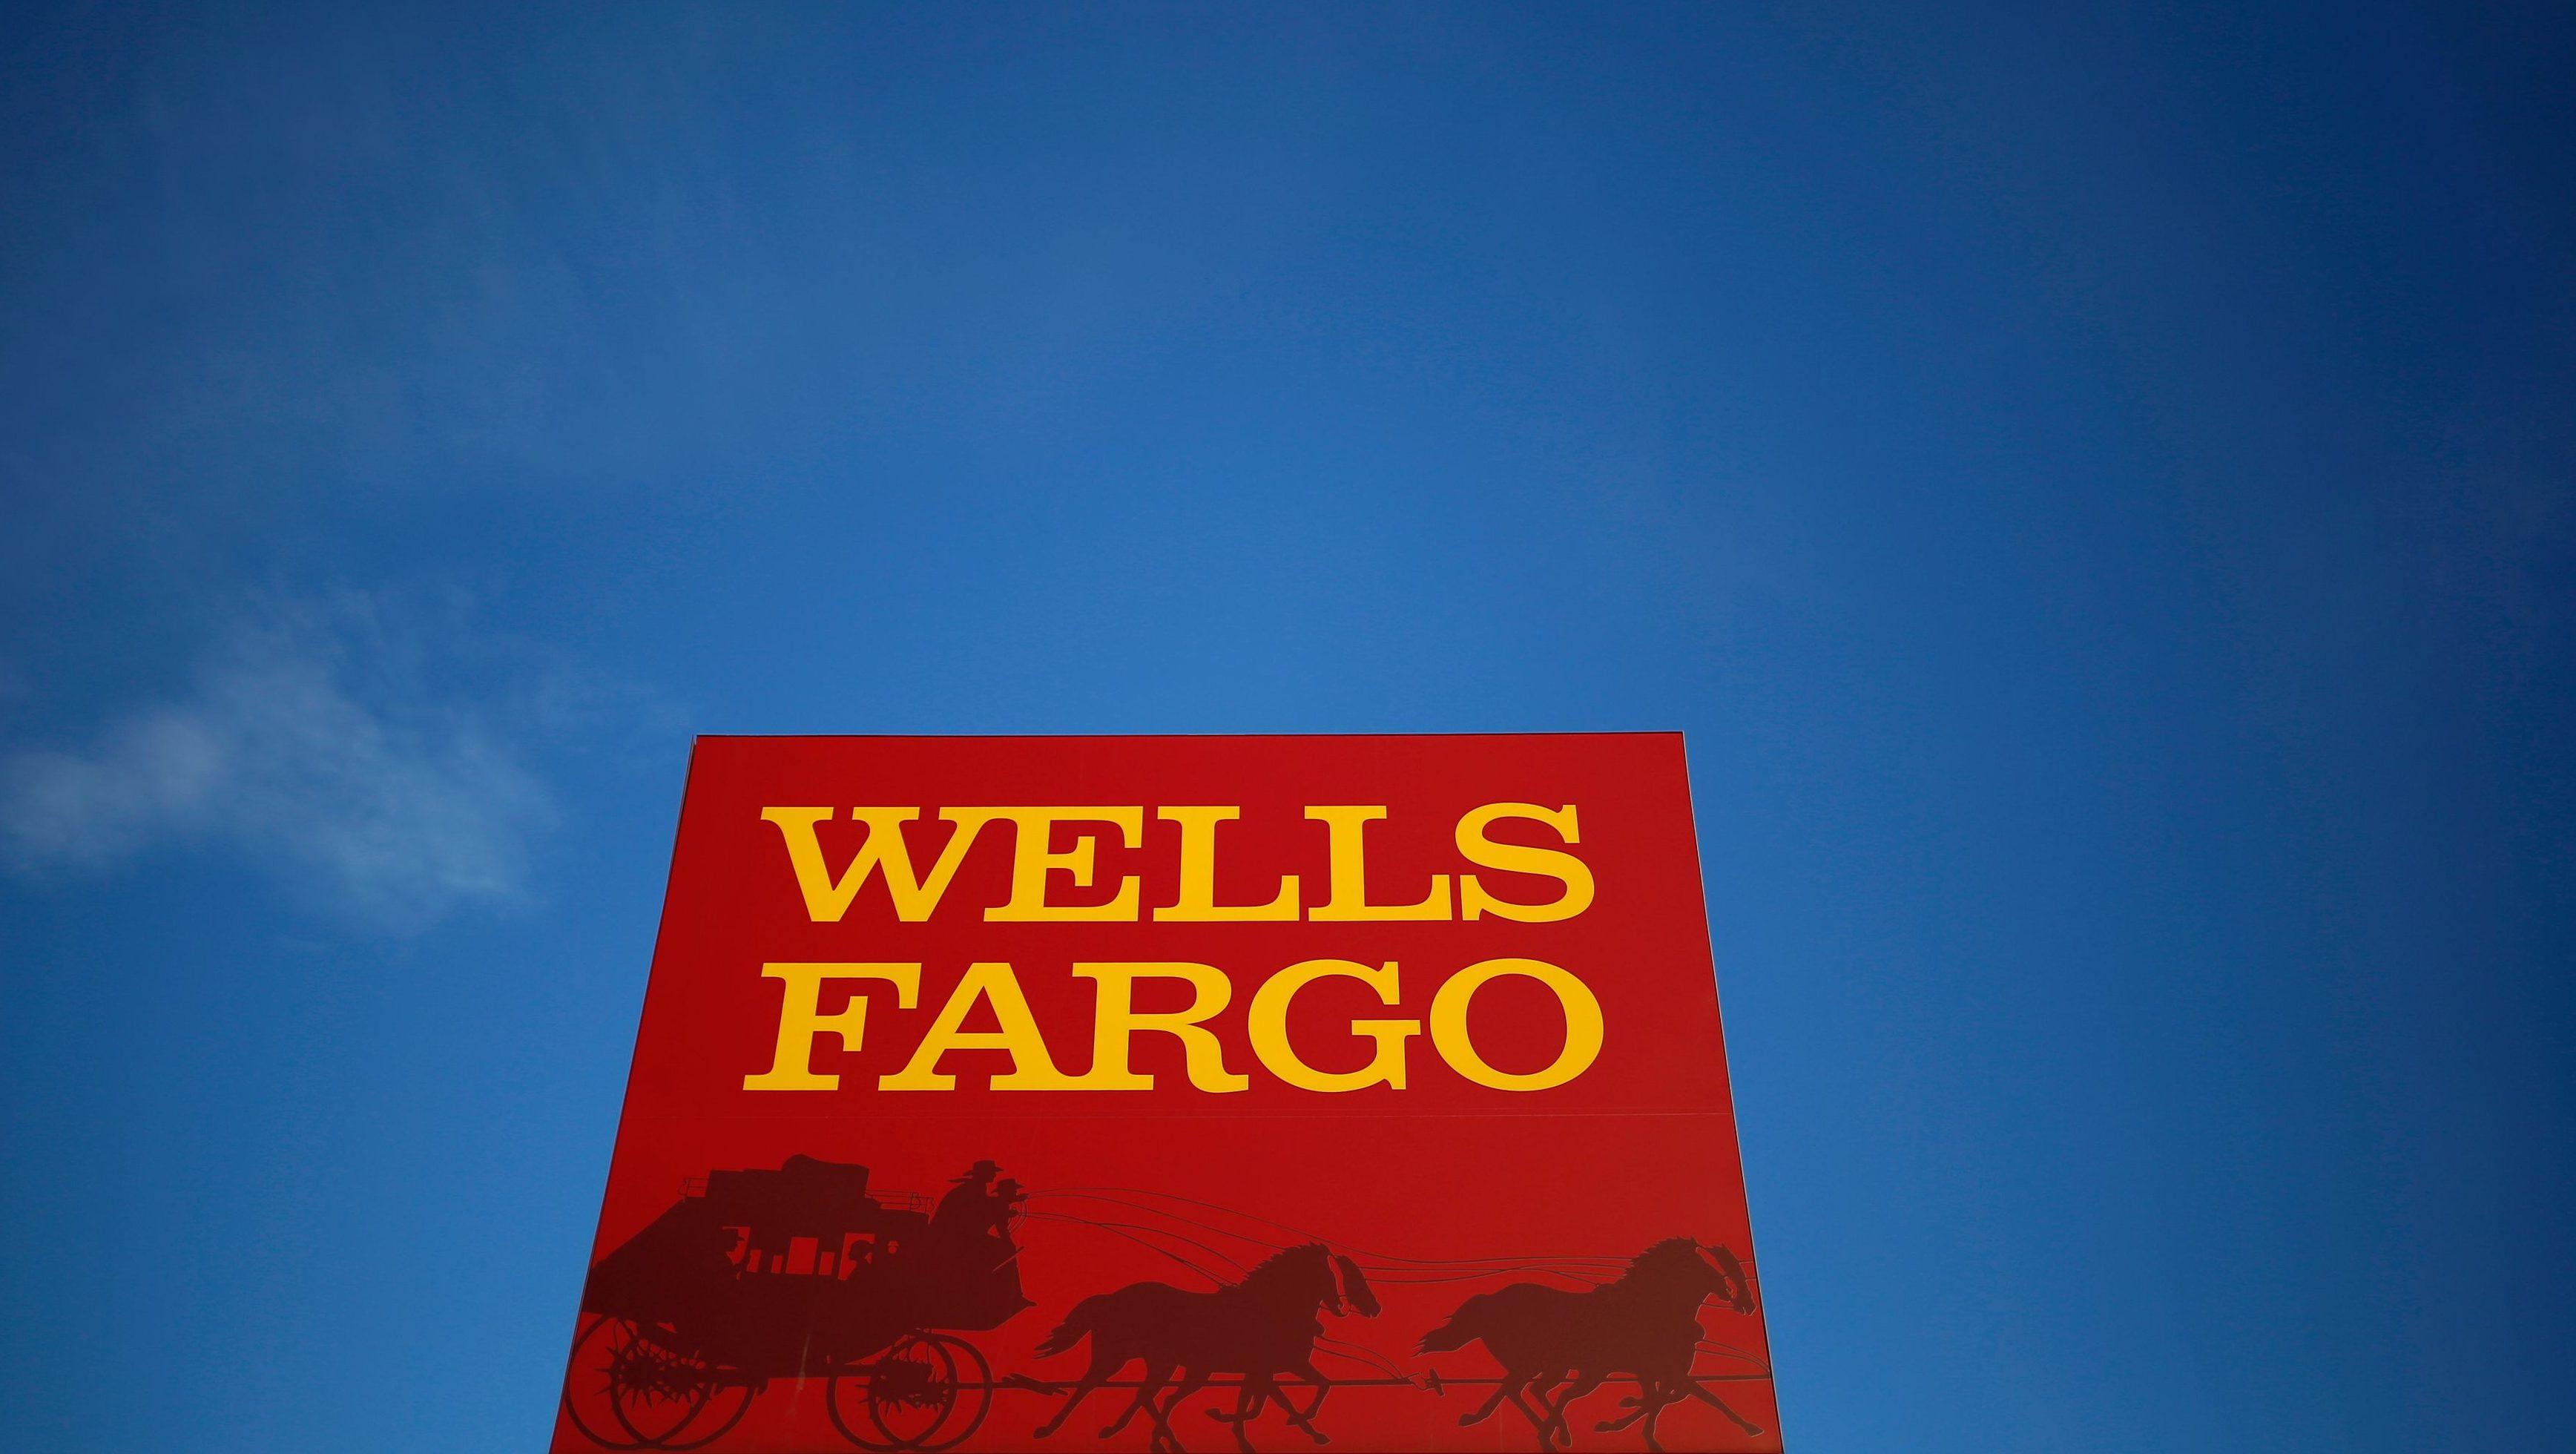 Wells Fargo's newest scandal